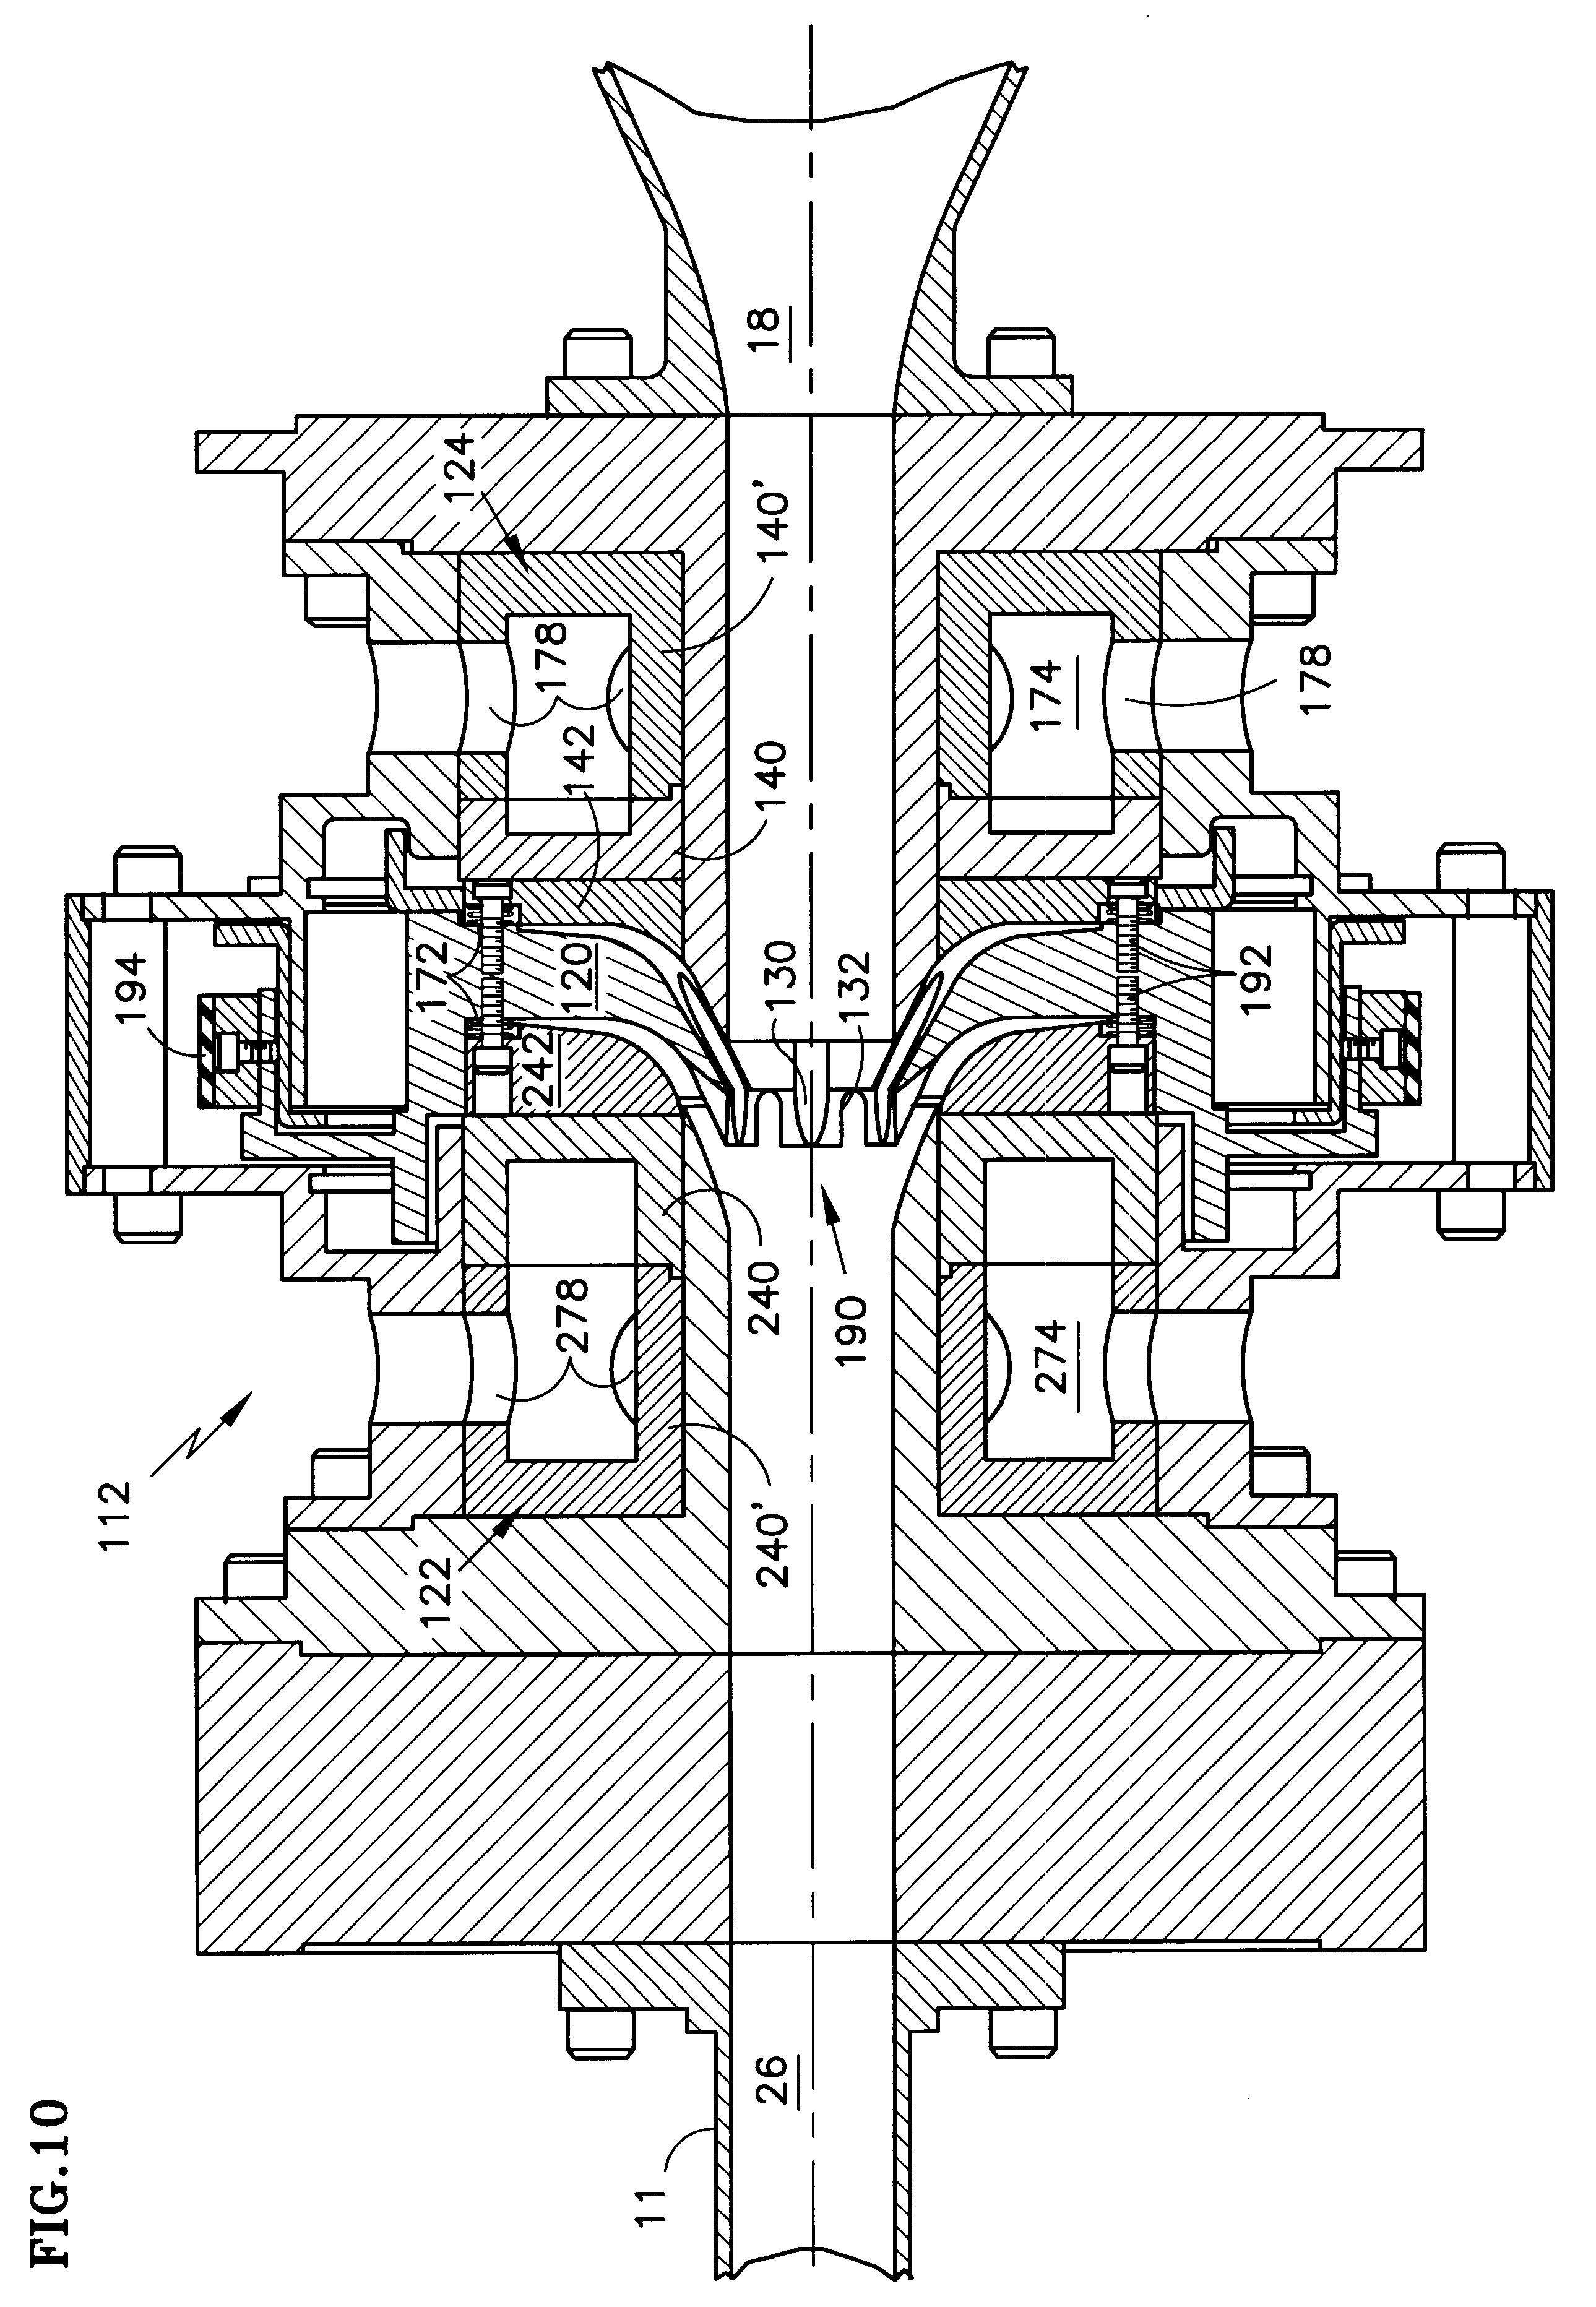 Bodine Emergency Ballast Wiring Diagram Bodine B100 Fluorescent ...